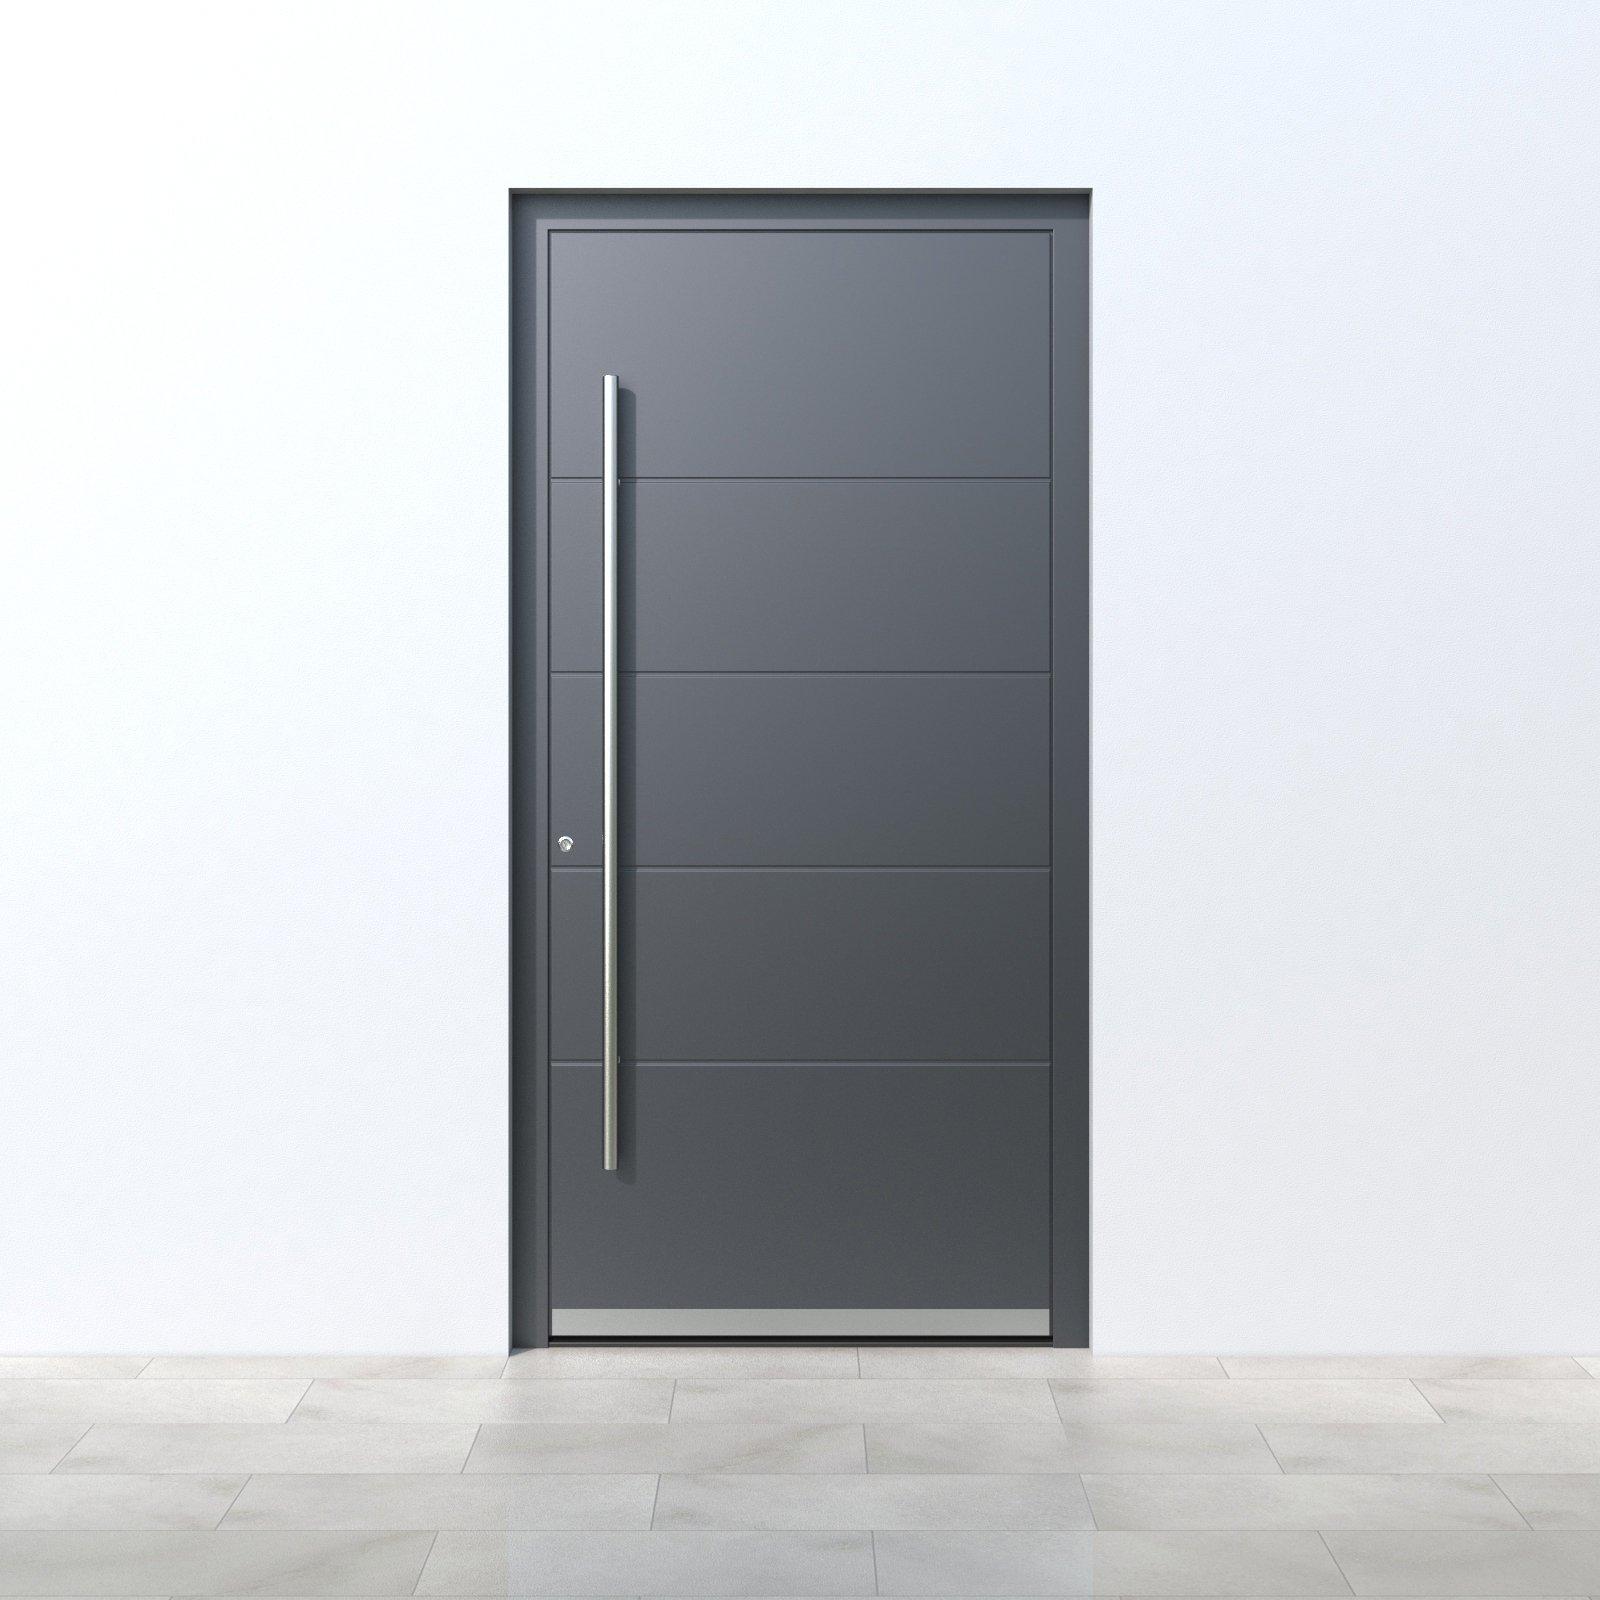 Pirnar_Quantum_QF20-standard Haustüren